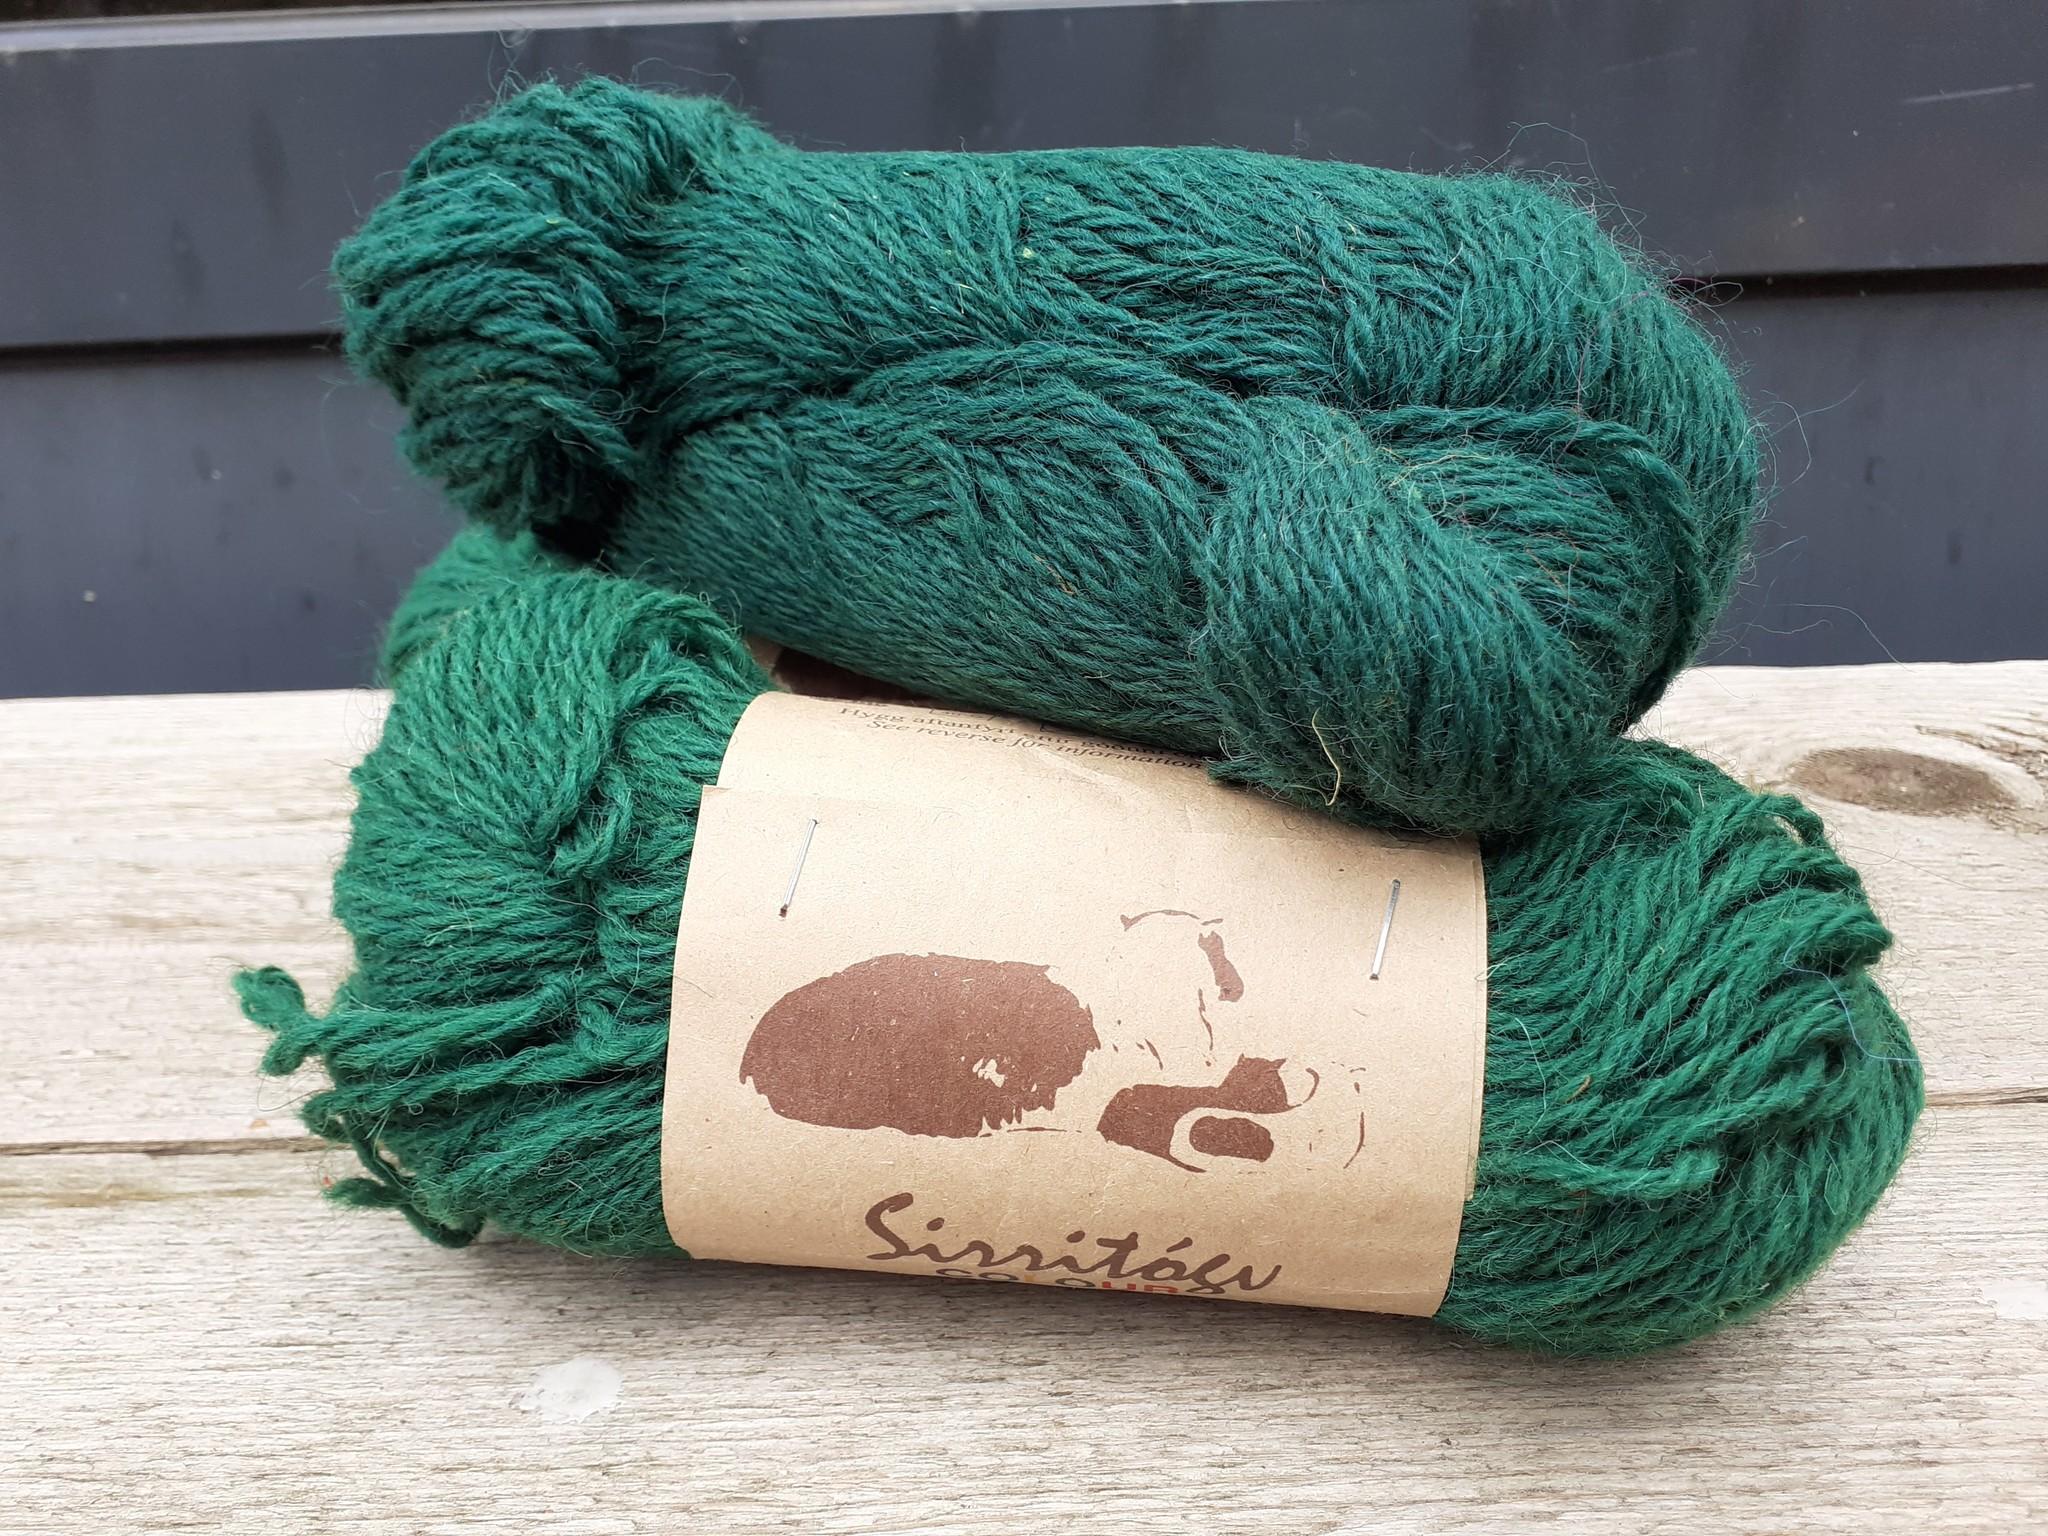 Sirritógv Sirritógv - 6 - Dark green